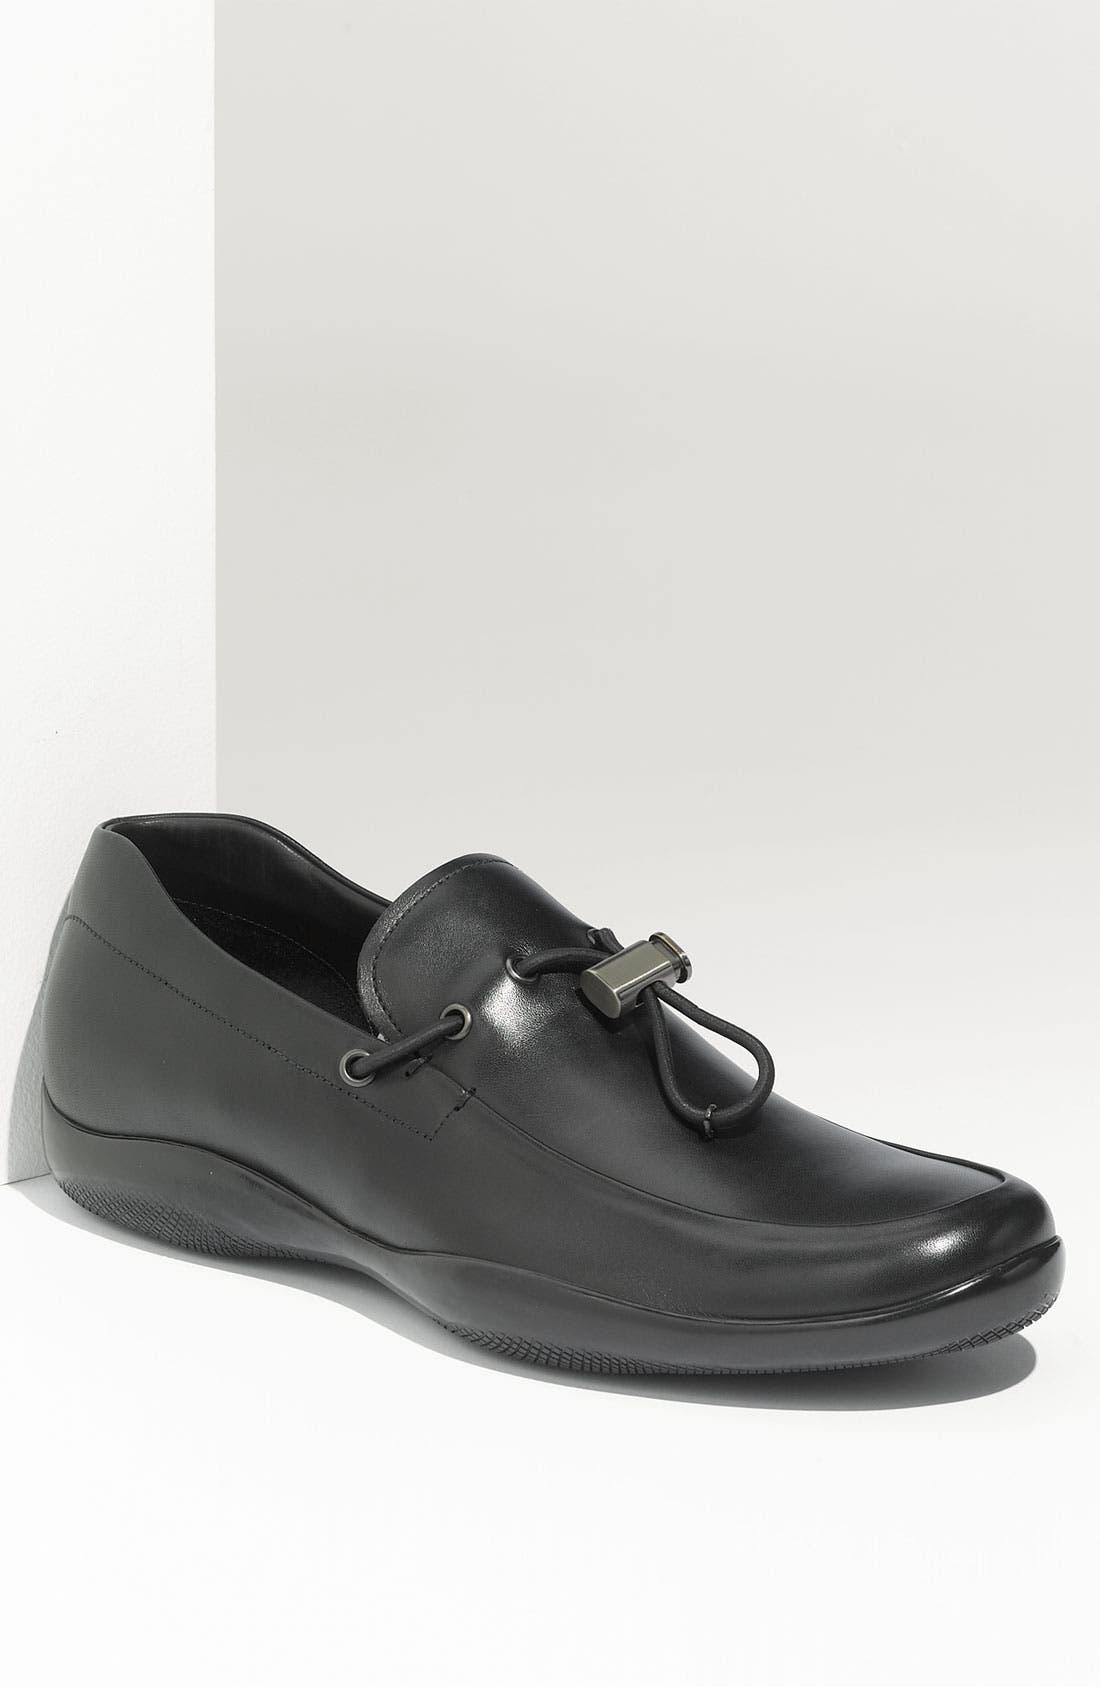 Main Image - Prada Leather Loafer